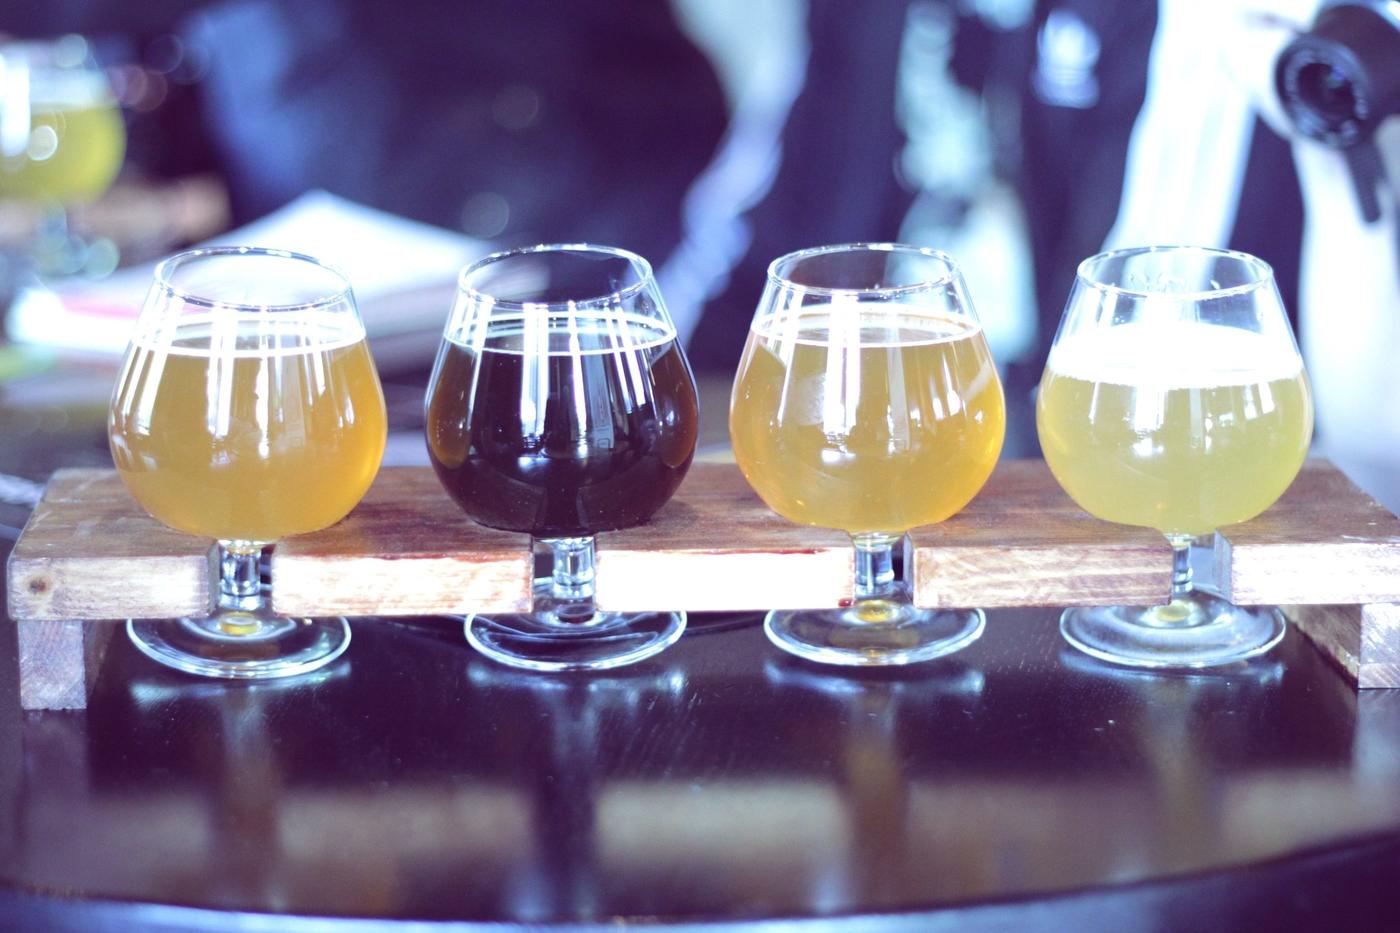 Kaleva Brewing Company ja Public House Huurre